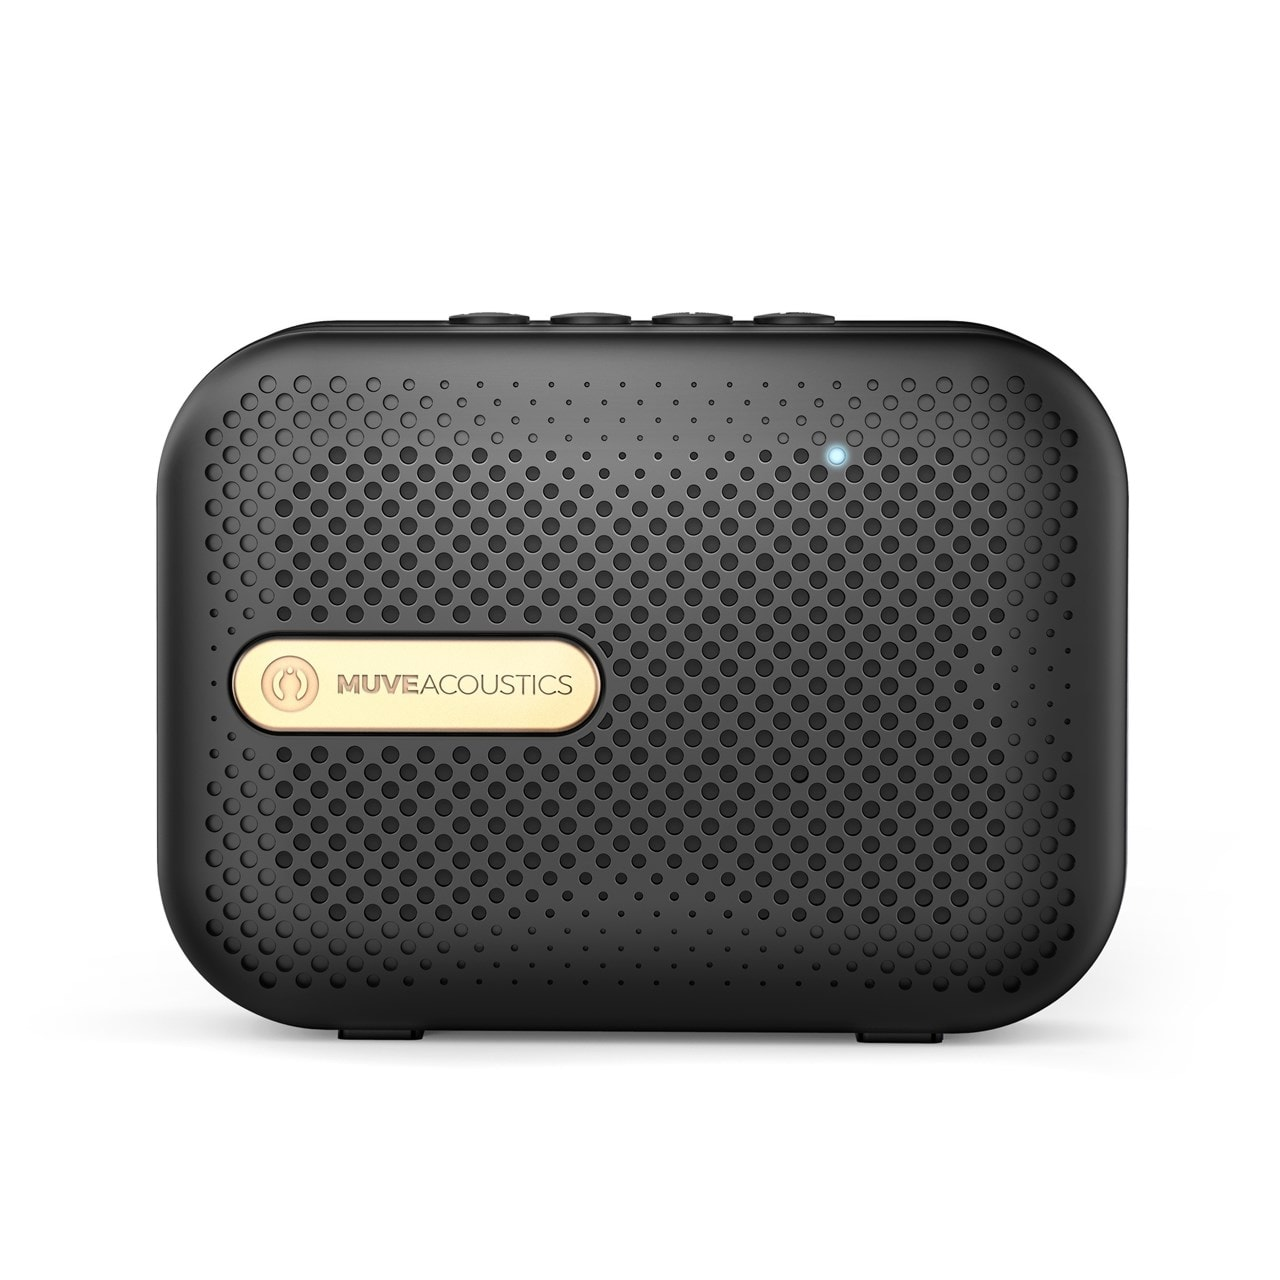 Muve Acoustic Box Black Bluetooth Speaker - 2